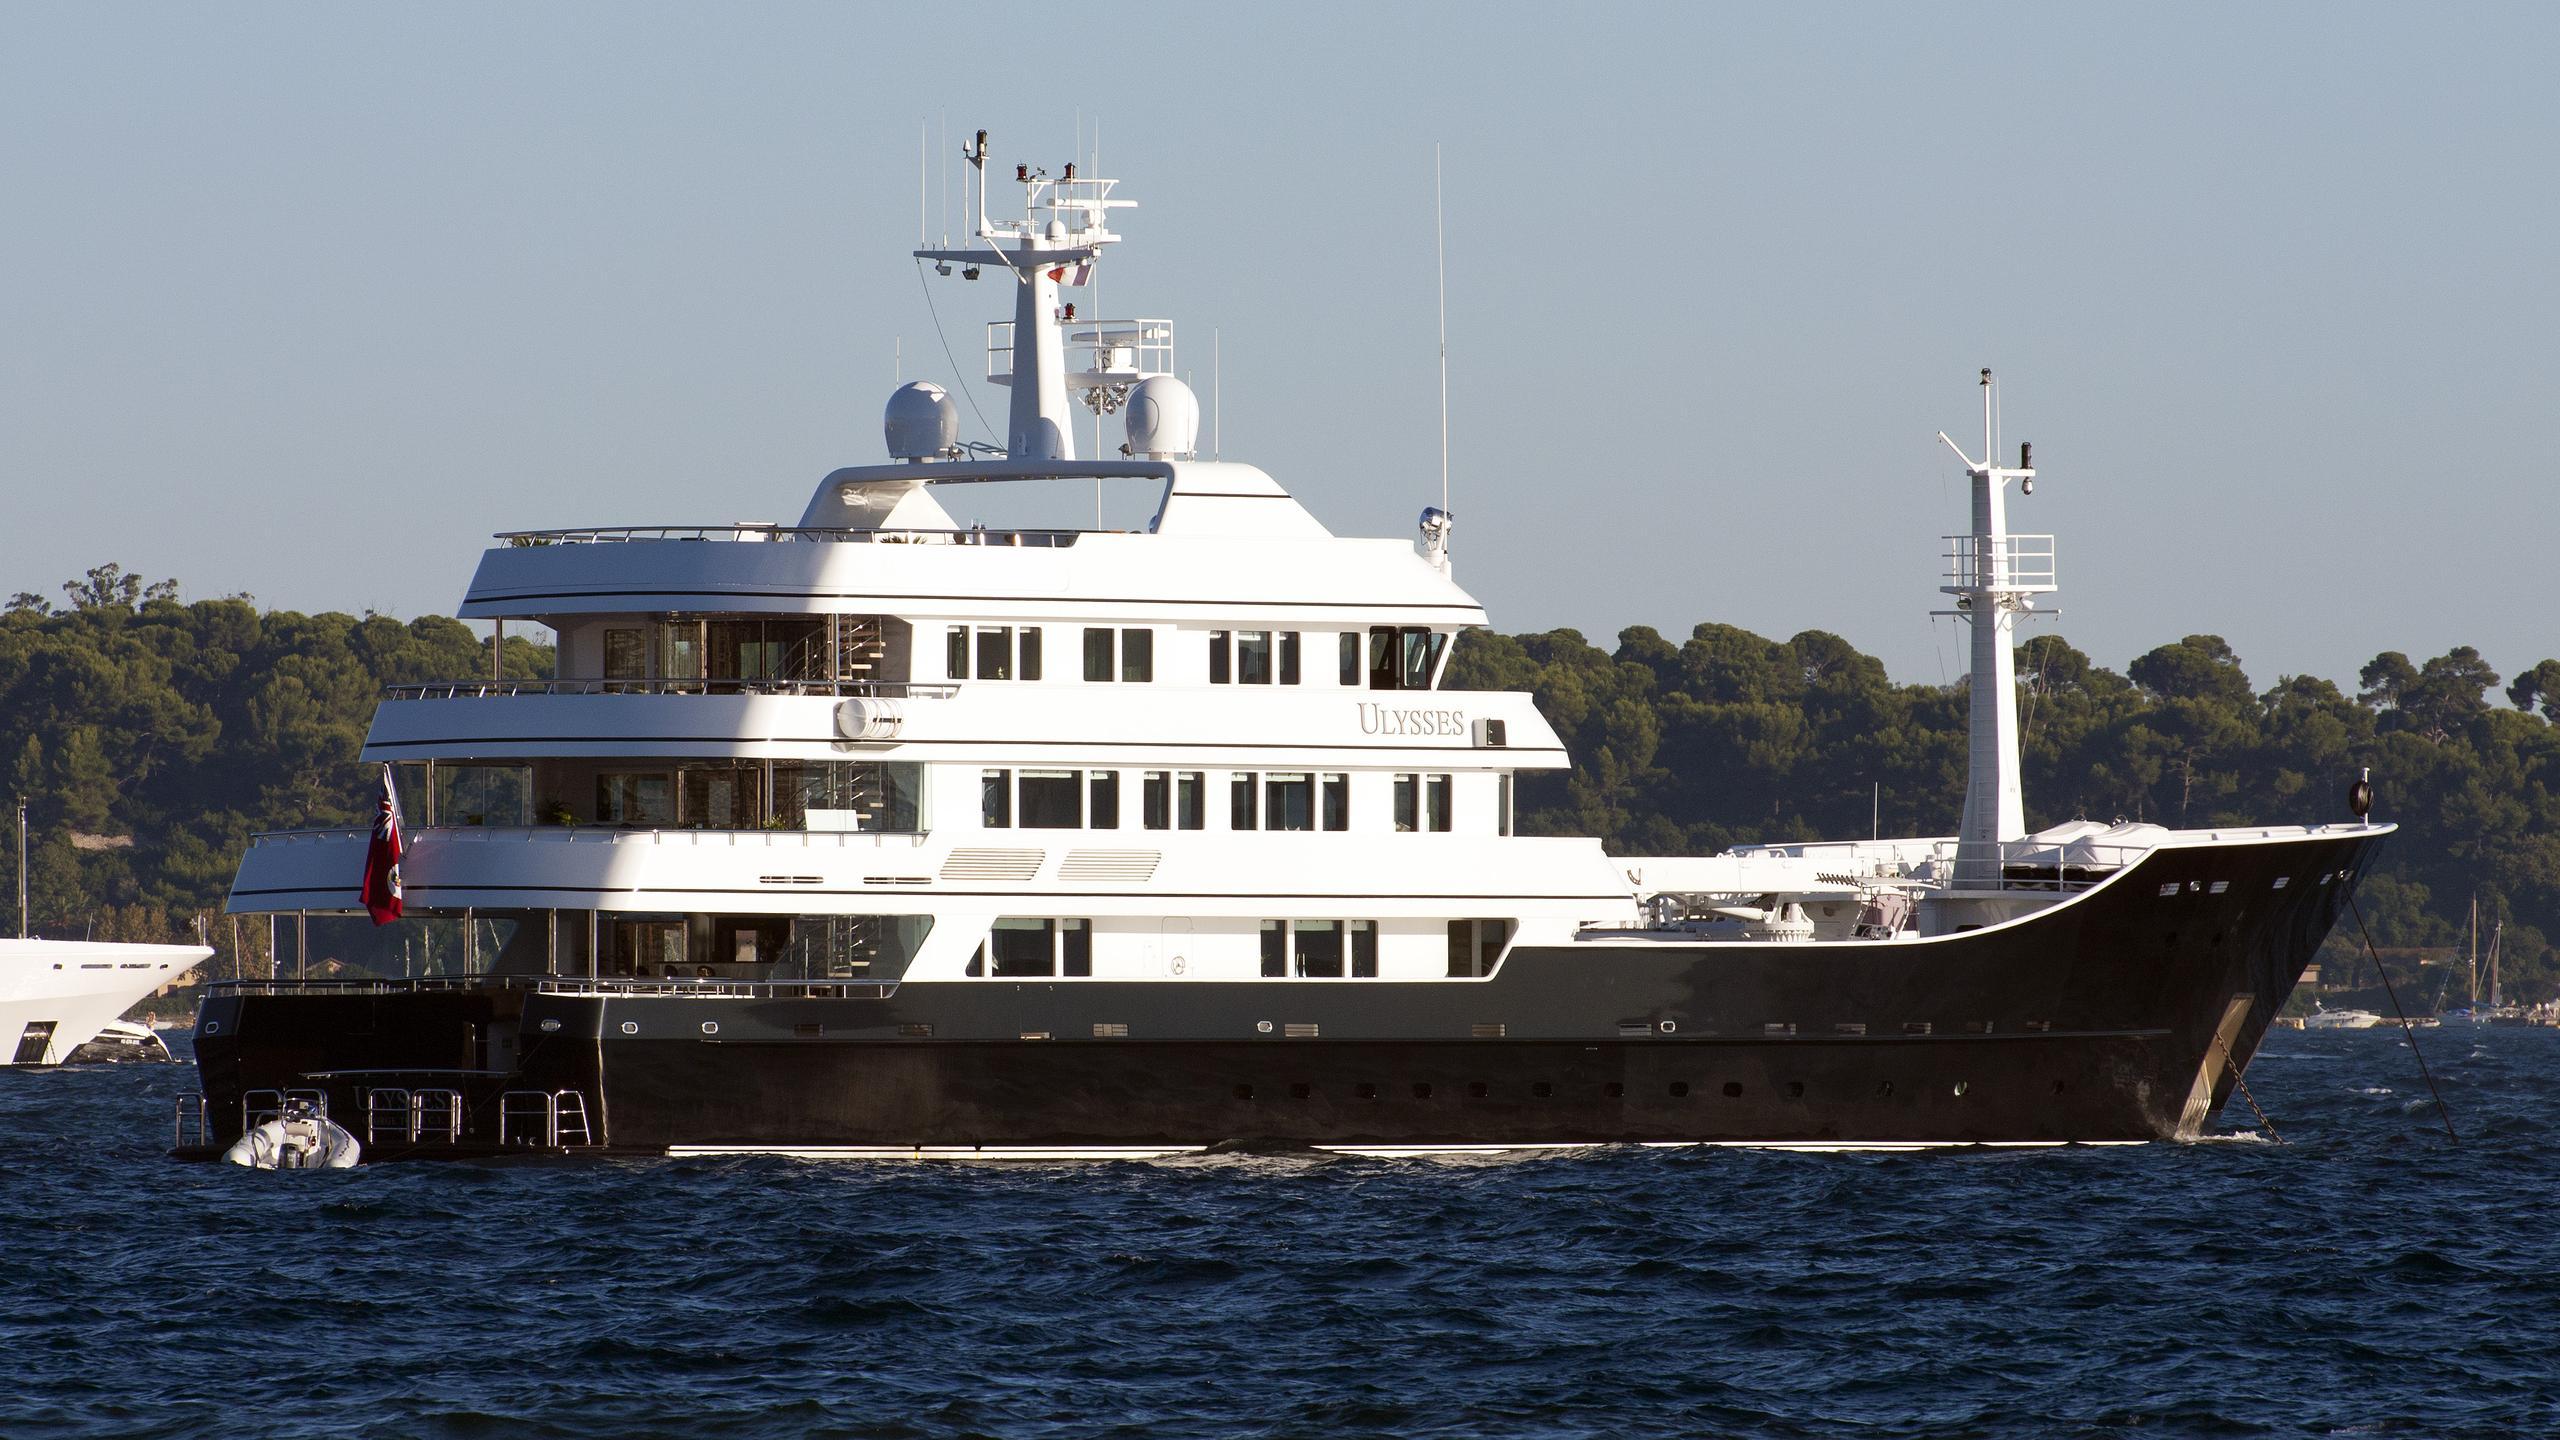 grand-rusalina-explorer-yacht-trinity-global-explorer-192-2003-59m-profile